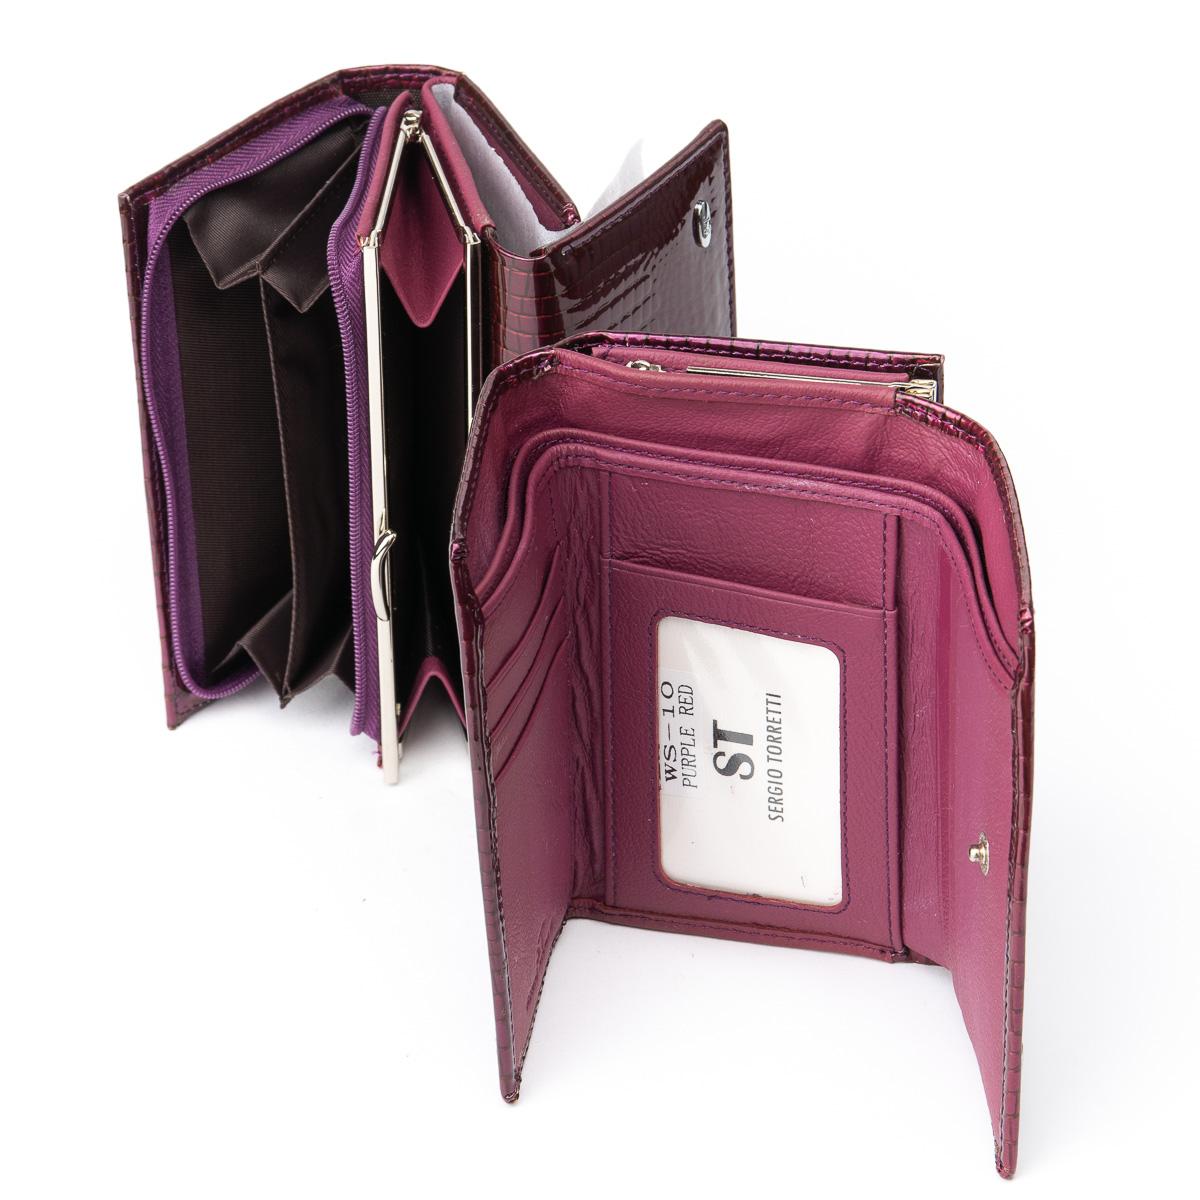 Кошелек LR кожа-лак SERGIO TORRETTI WS-10 purple-red - фото 4